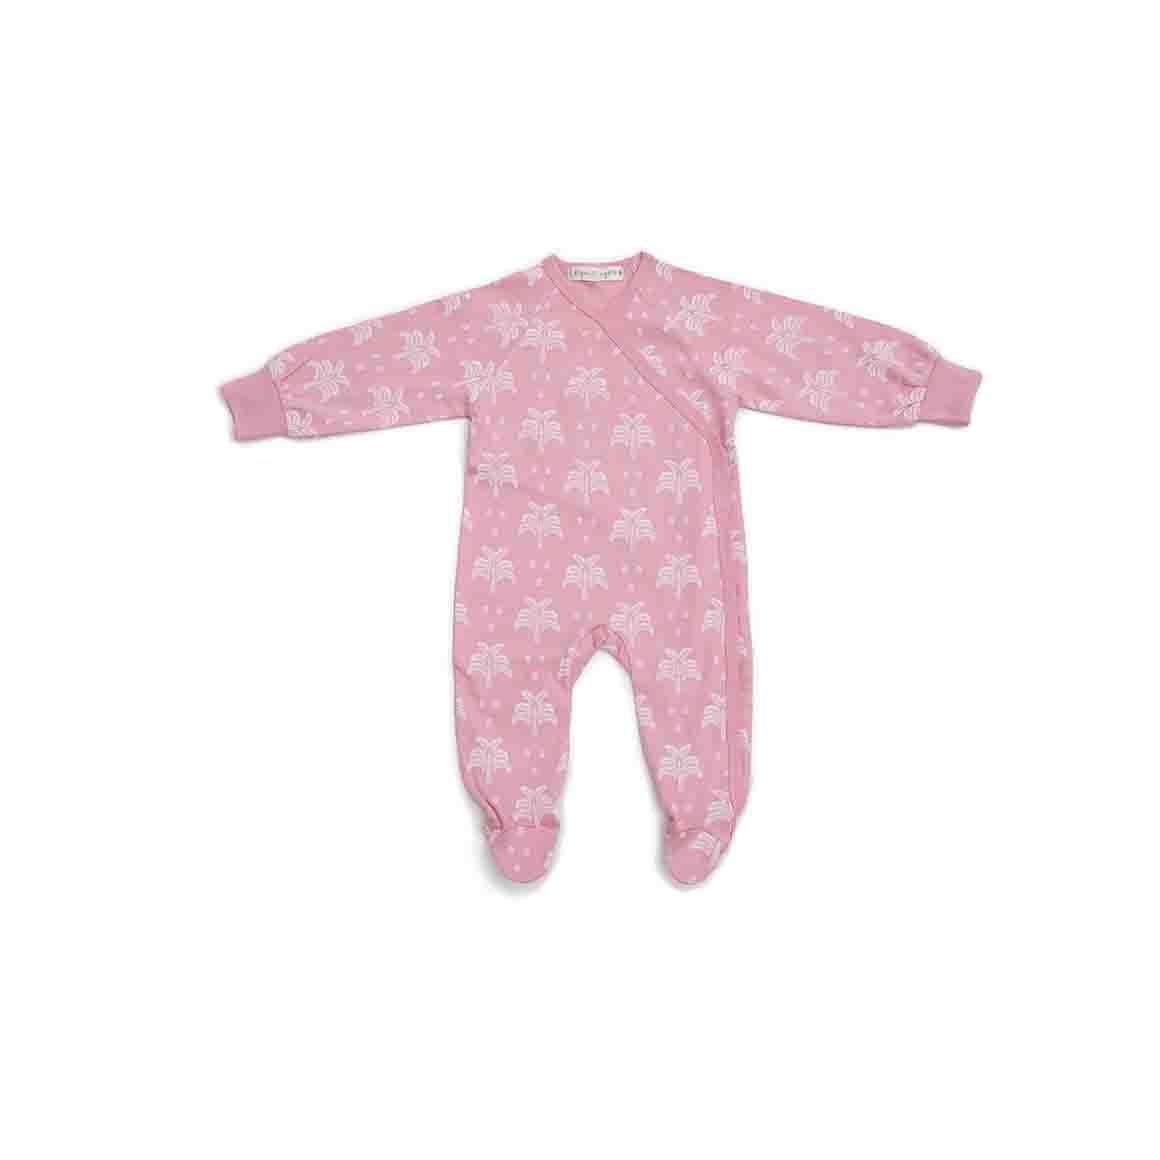 Baby Sleepsuit Kimono With Feet (Blush Pink - Palms & Pineapples Print)   Trada Marketplace